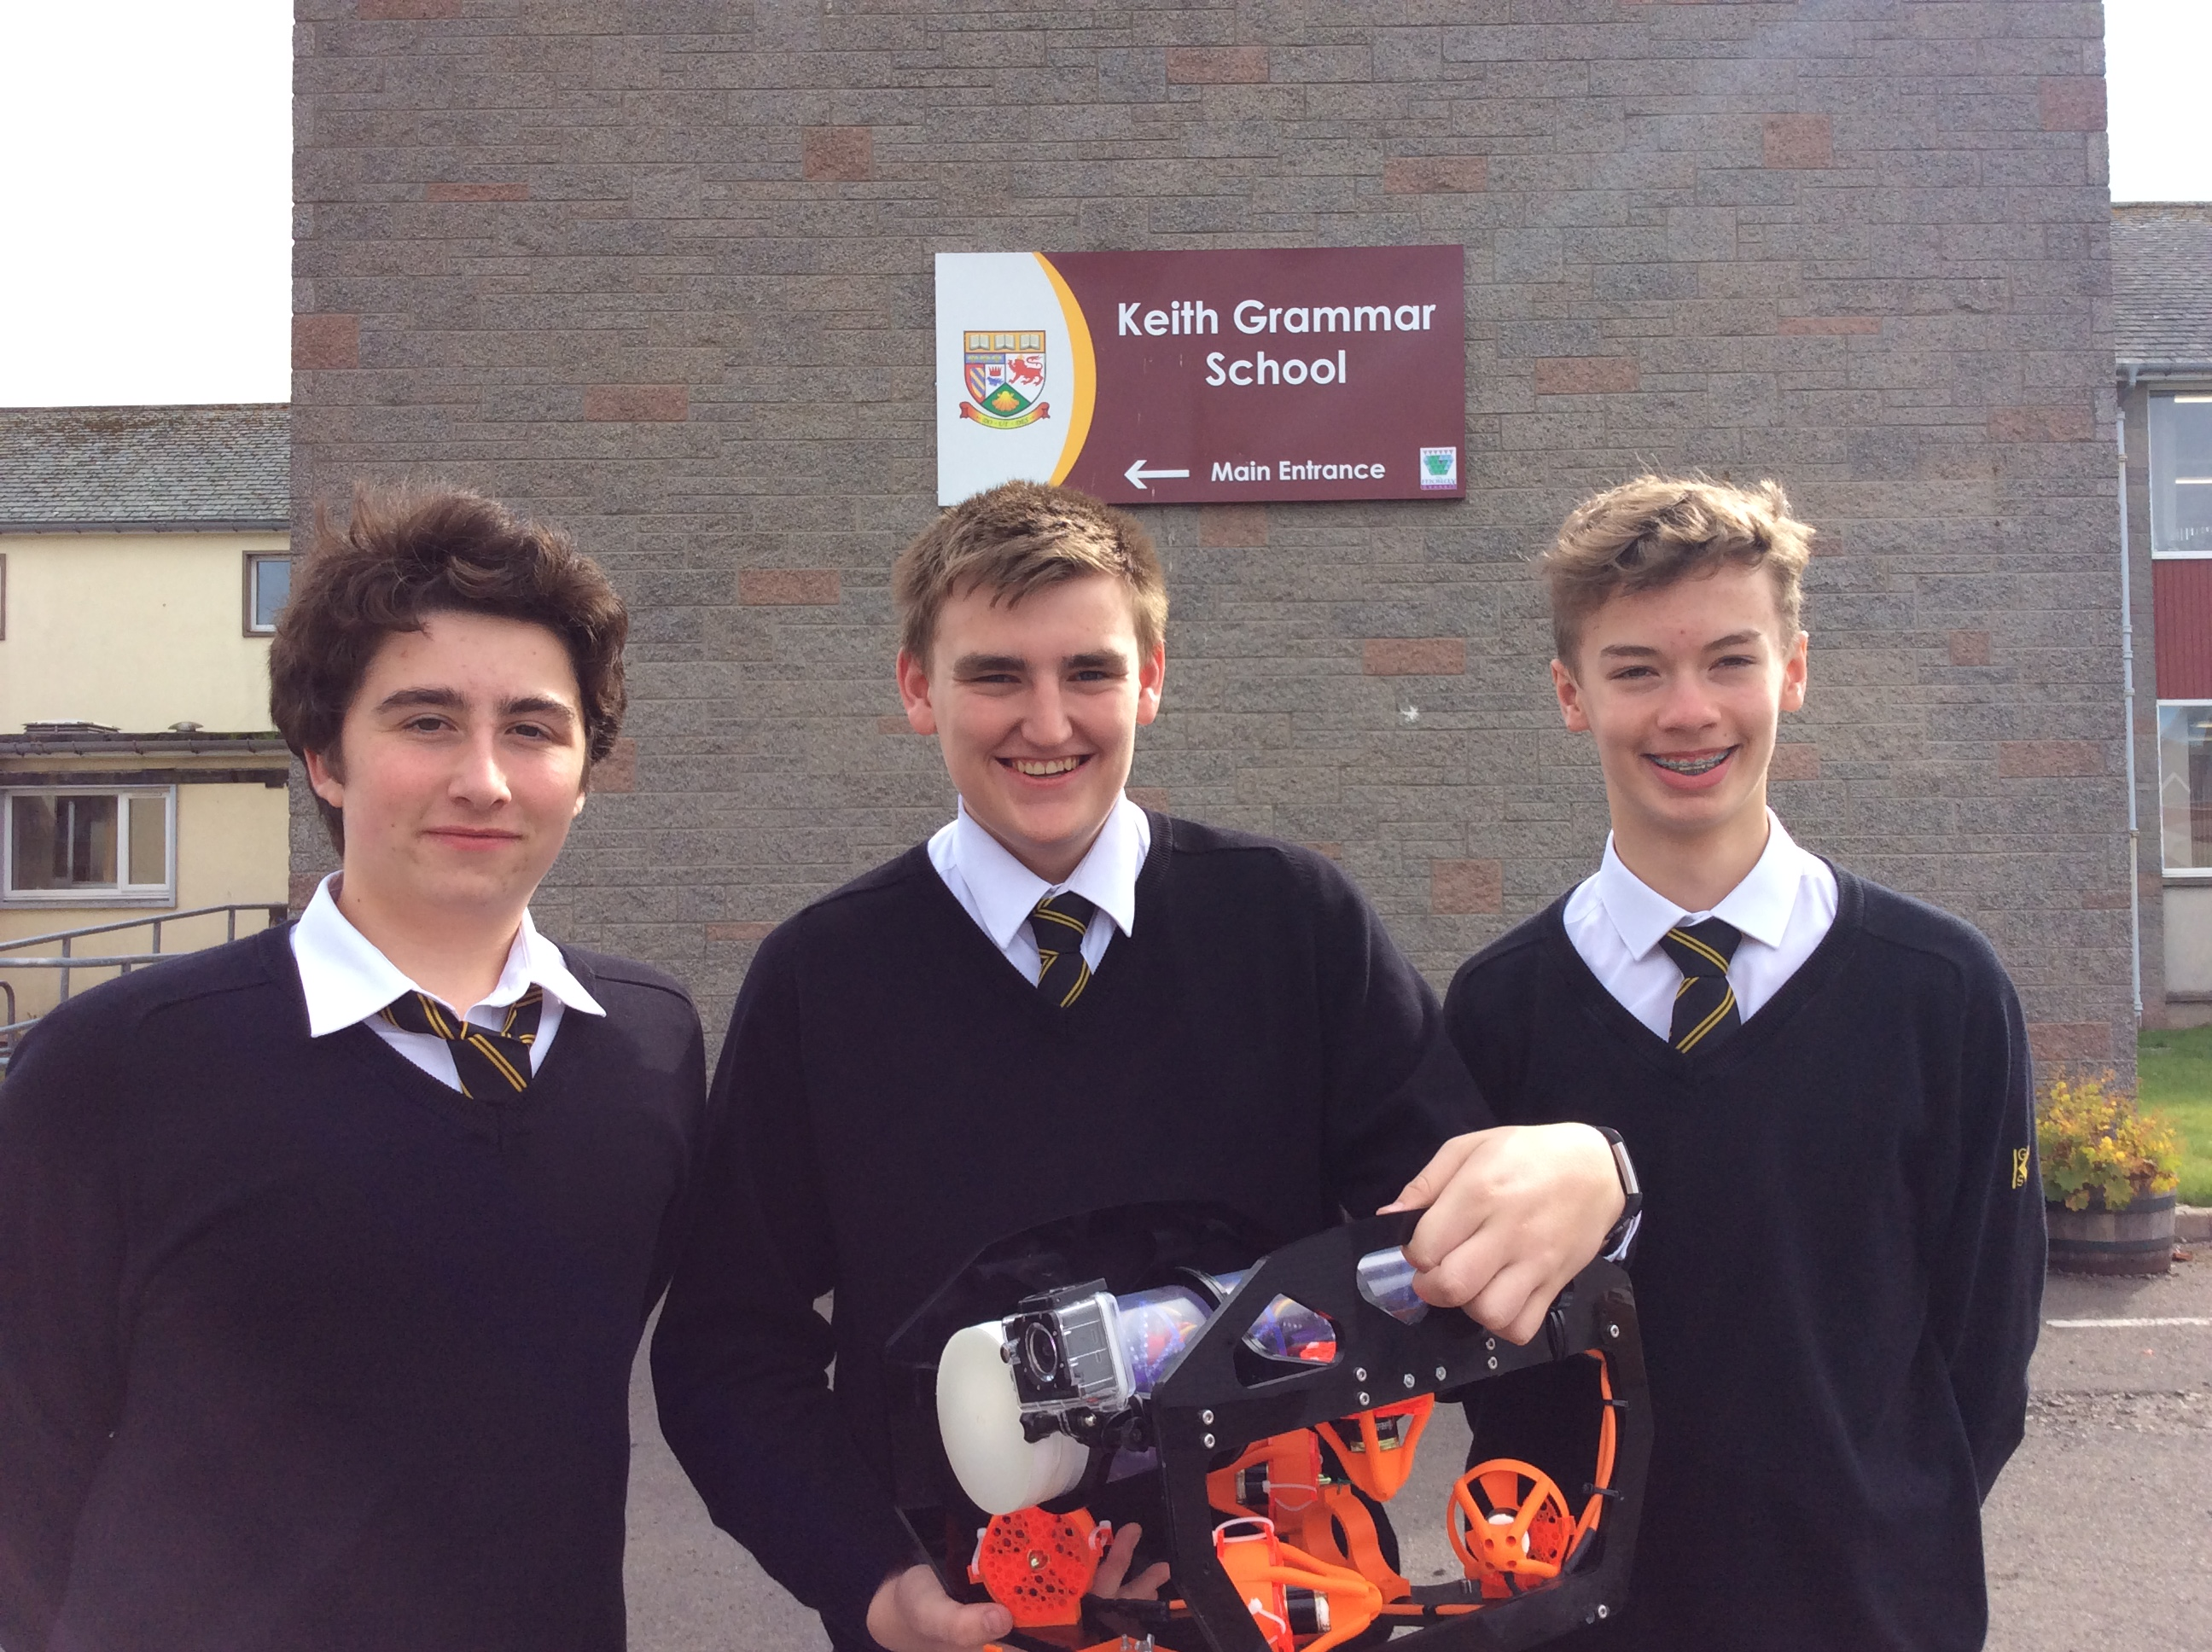 Lewis Roger, Tom Watson, Jamie Herd from Keith Grammar School with their ROV